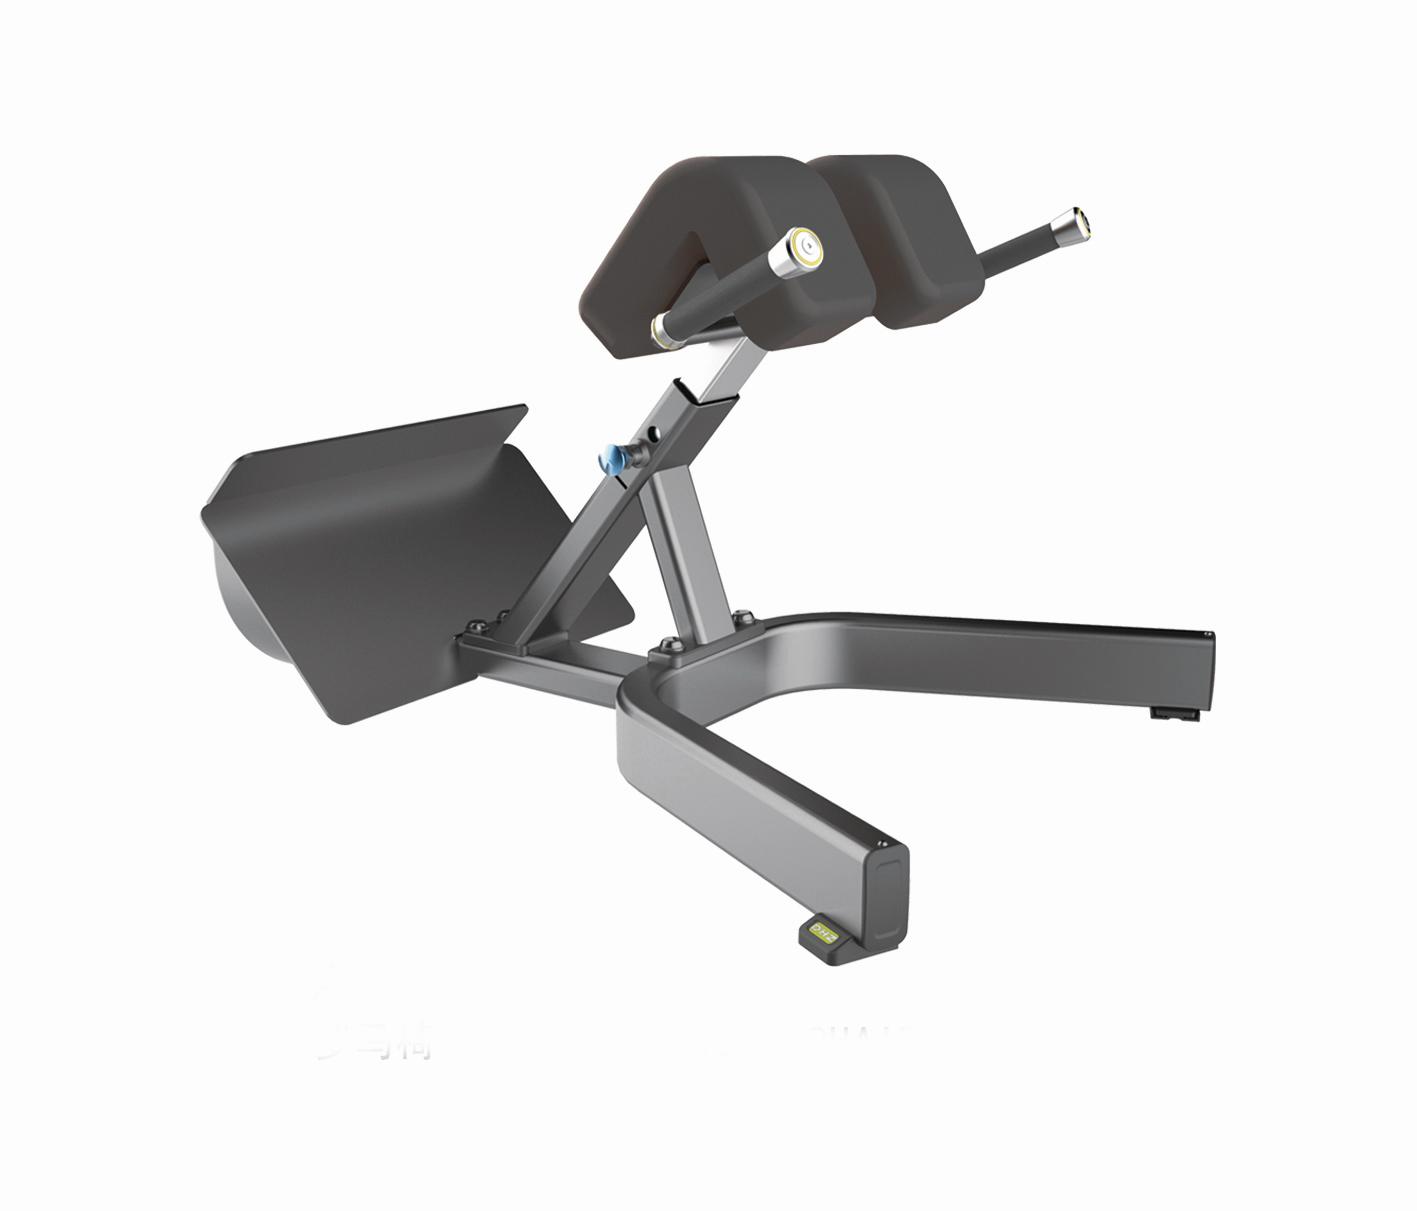 Тренажер GROME Fitness AXD5045A Гиперэкстензия регулируемая. Угол наклона - 45 градусов.